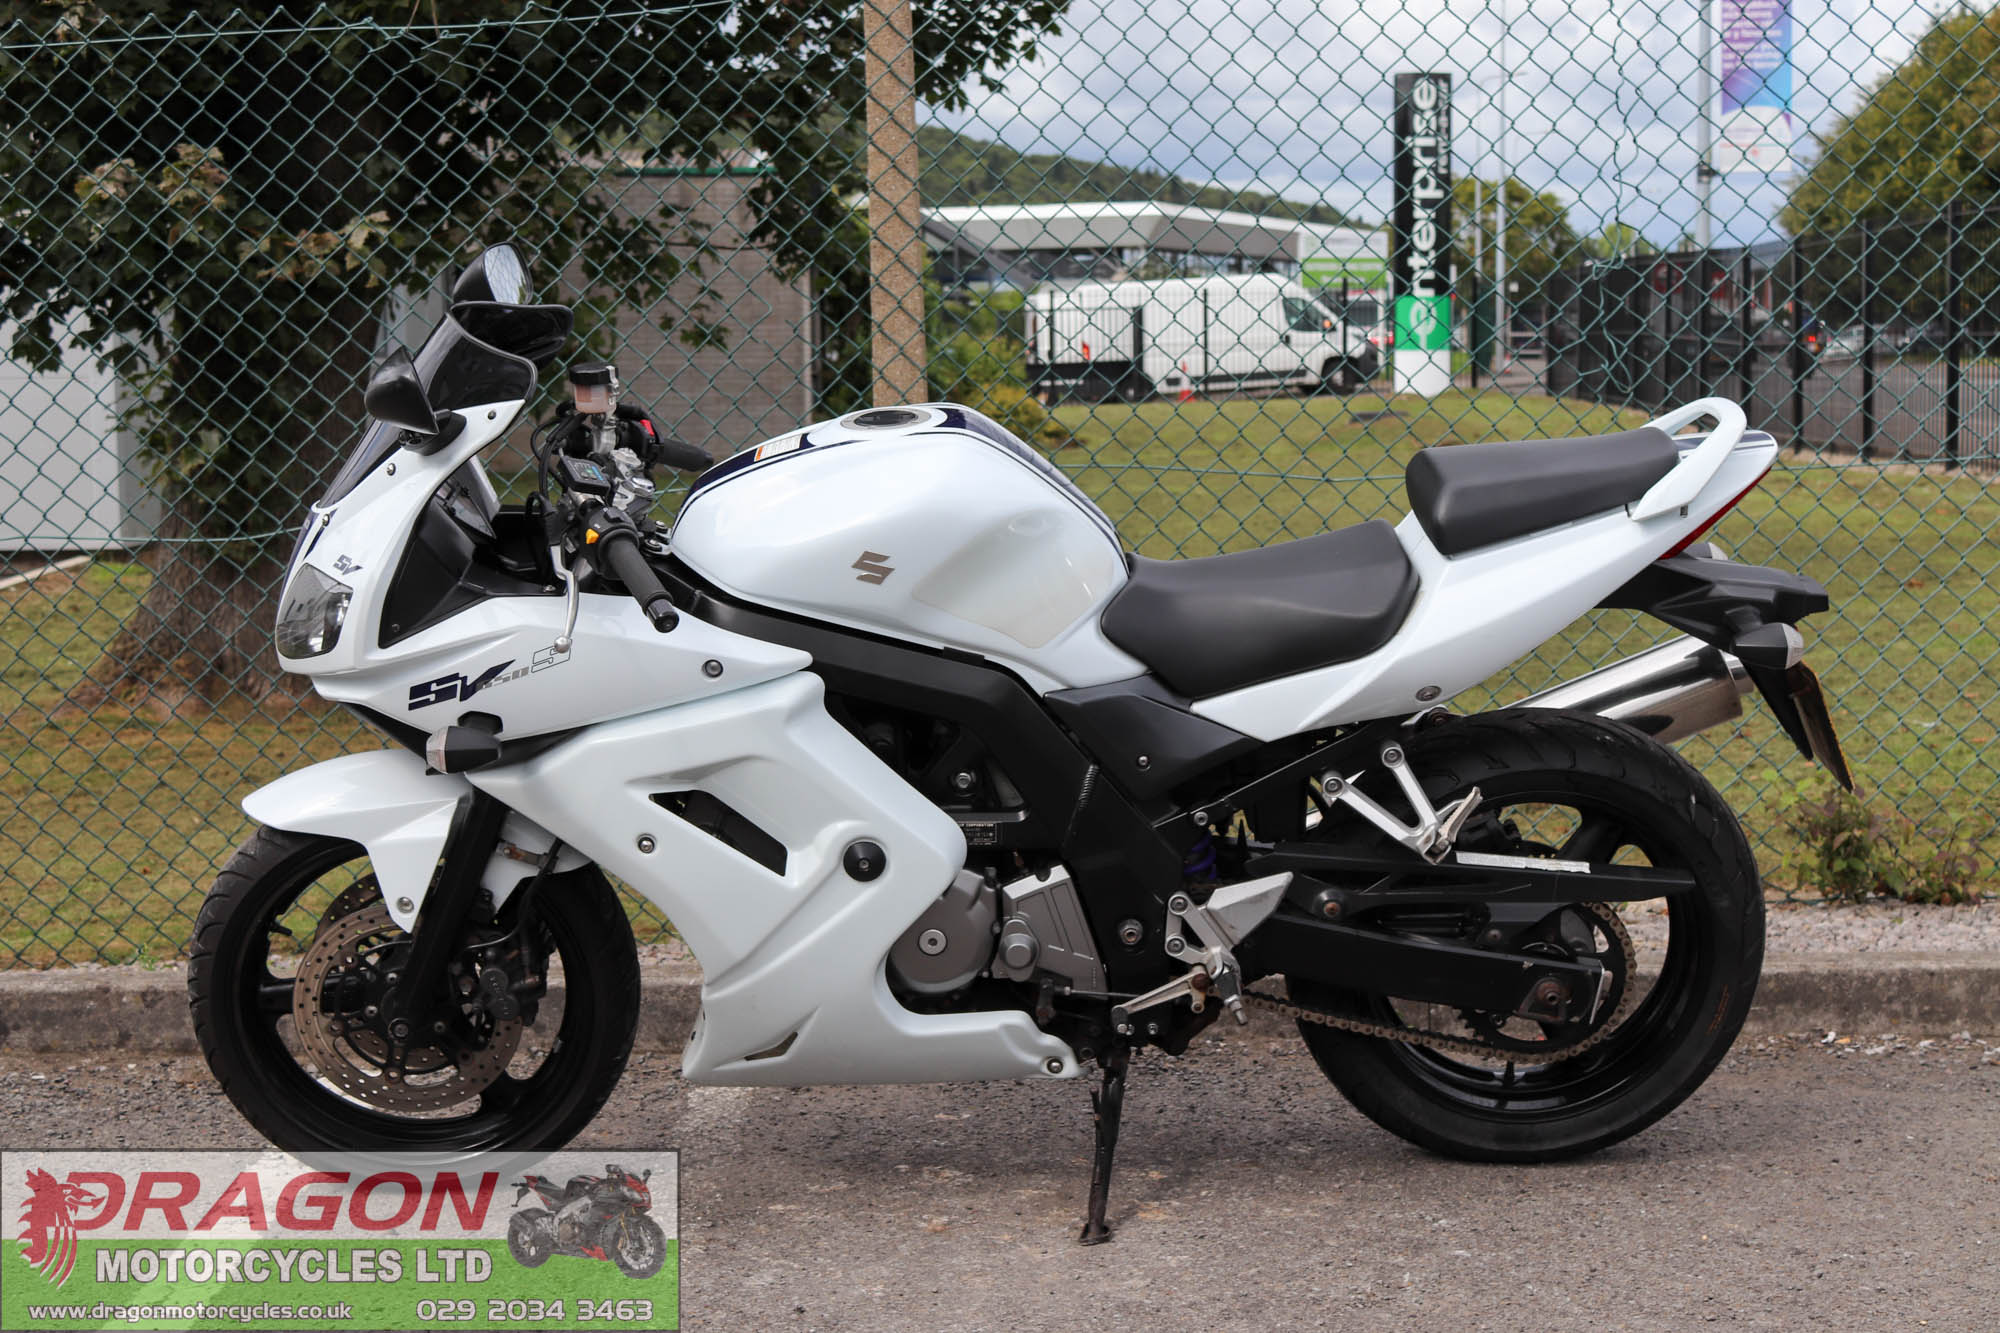 SUZUKI SV650S (2016) for sale [ref: 56477003]   MCN